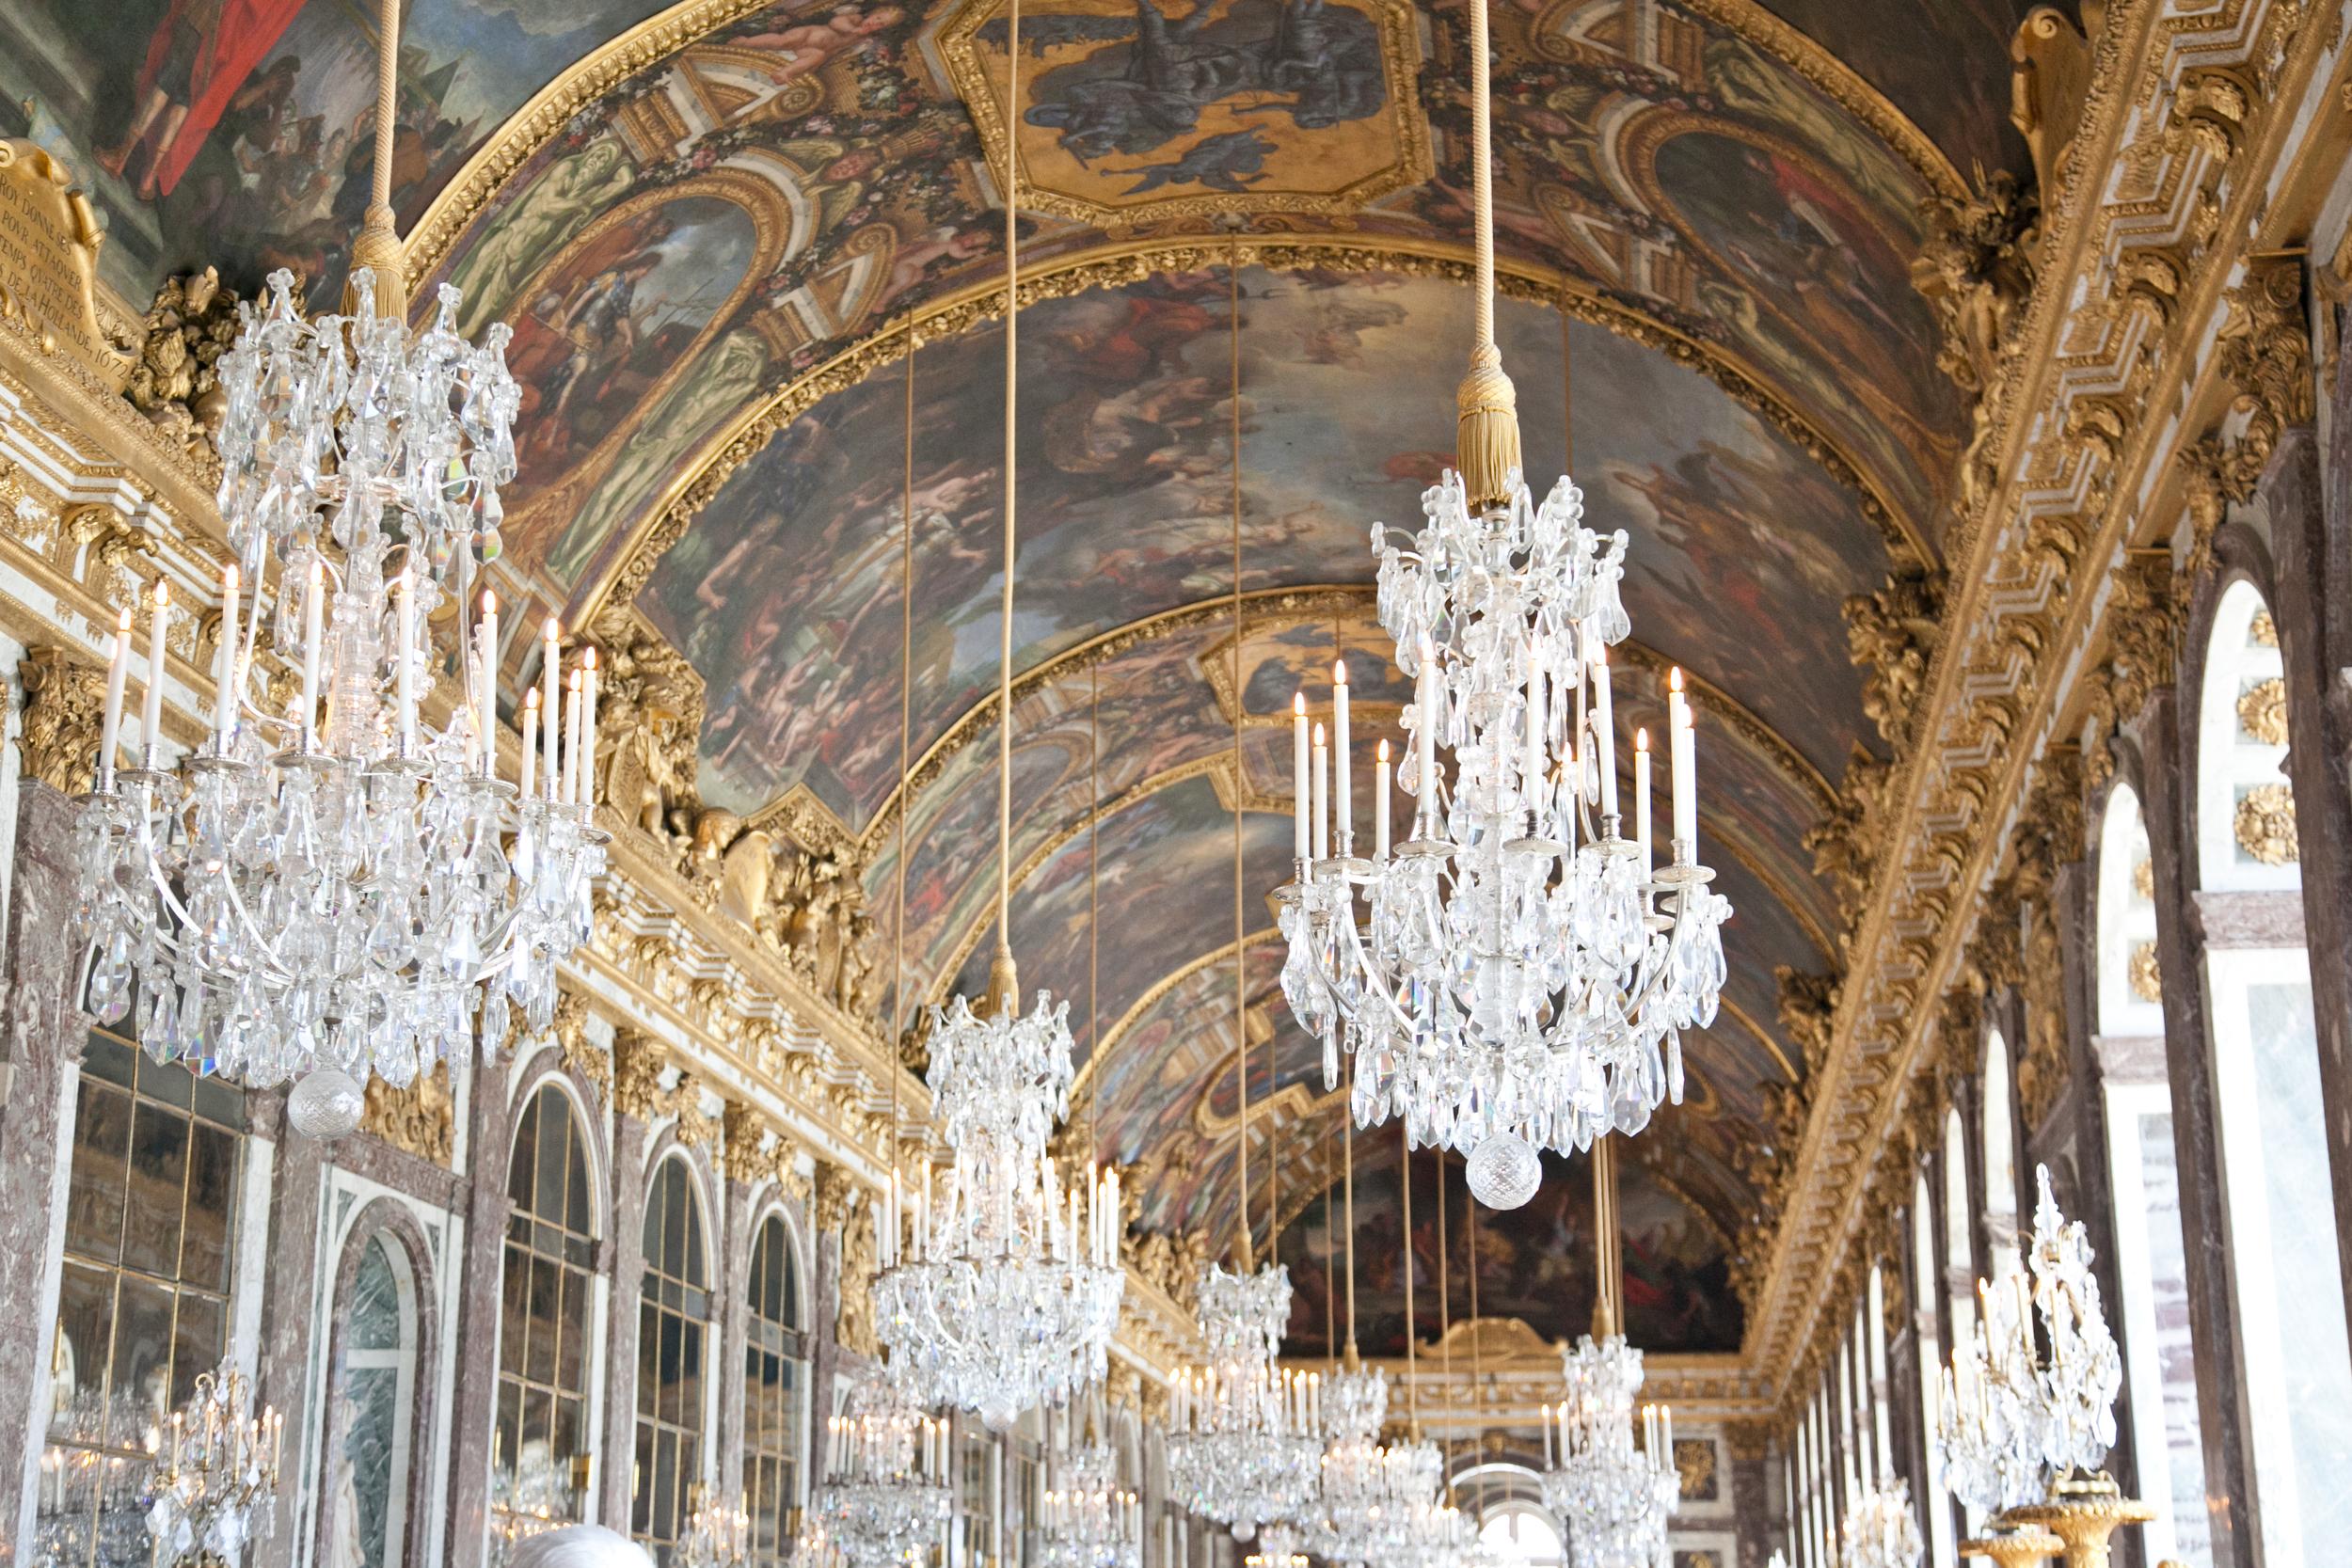 IMG_2643-versailles-paris-france-trisa-tro.jpg